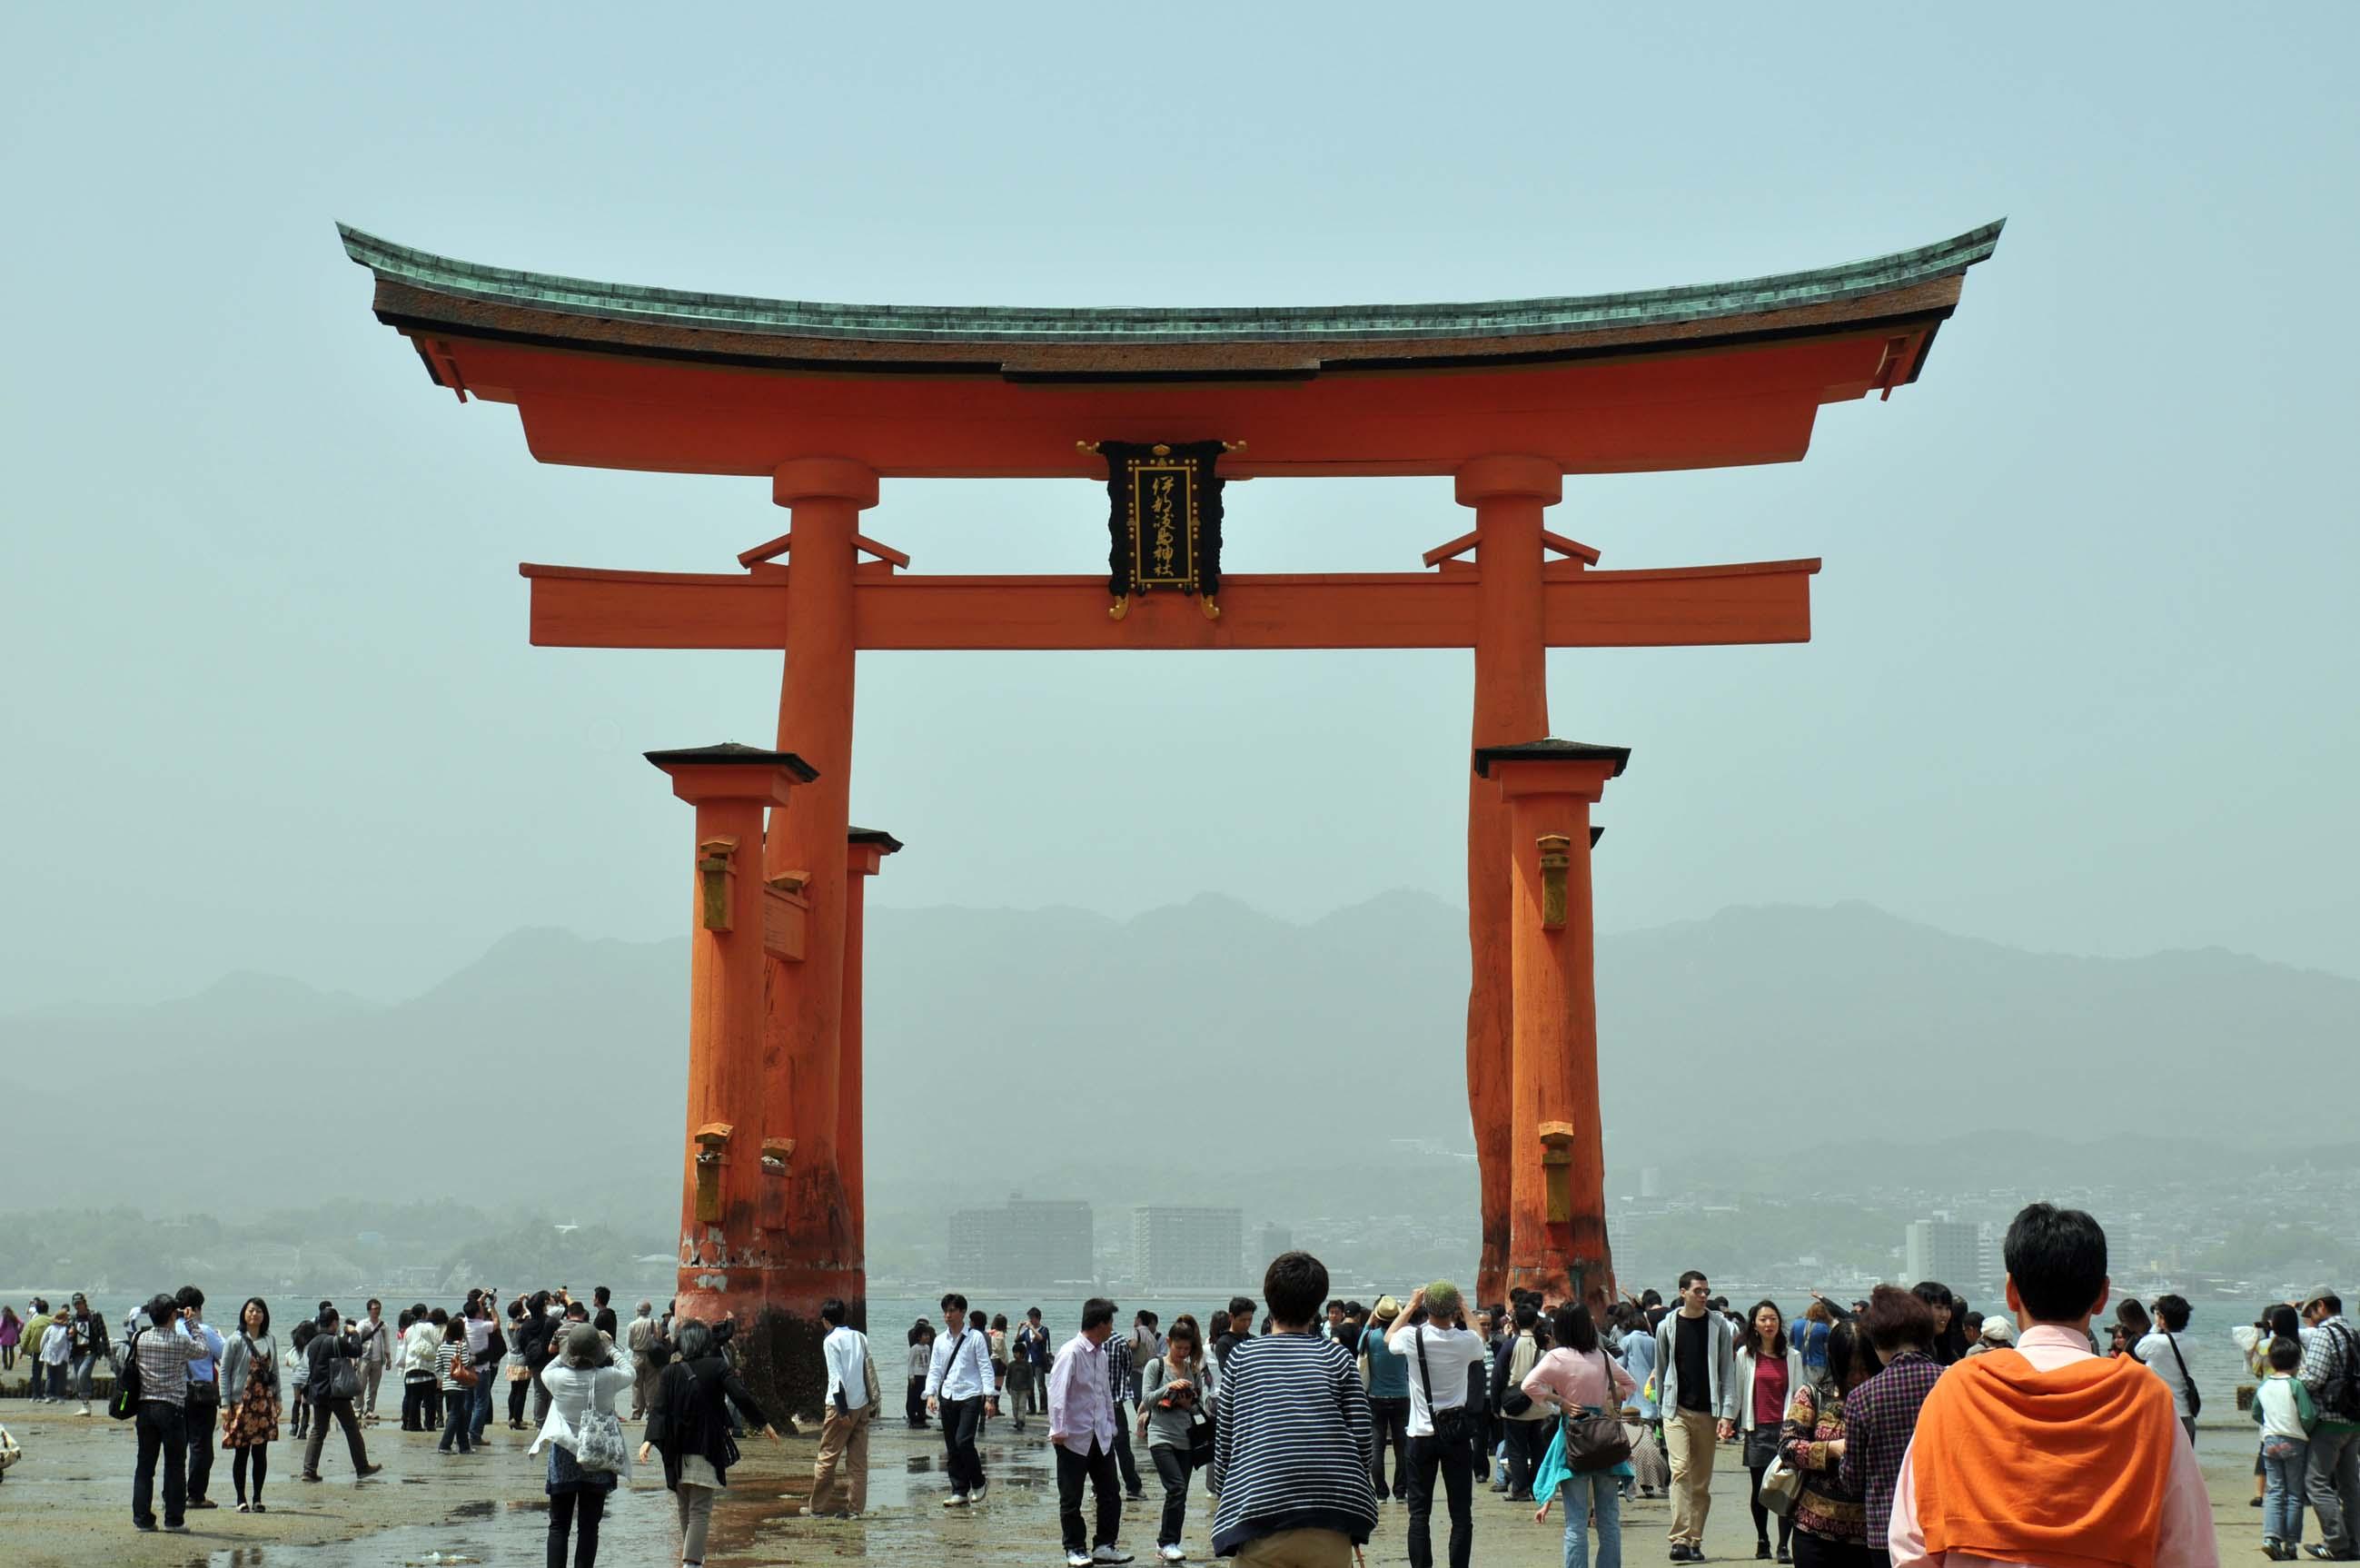 厳島神社の画像 p1_40